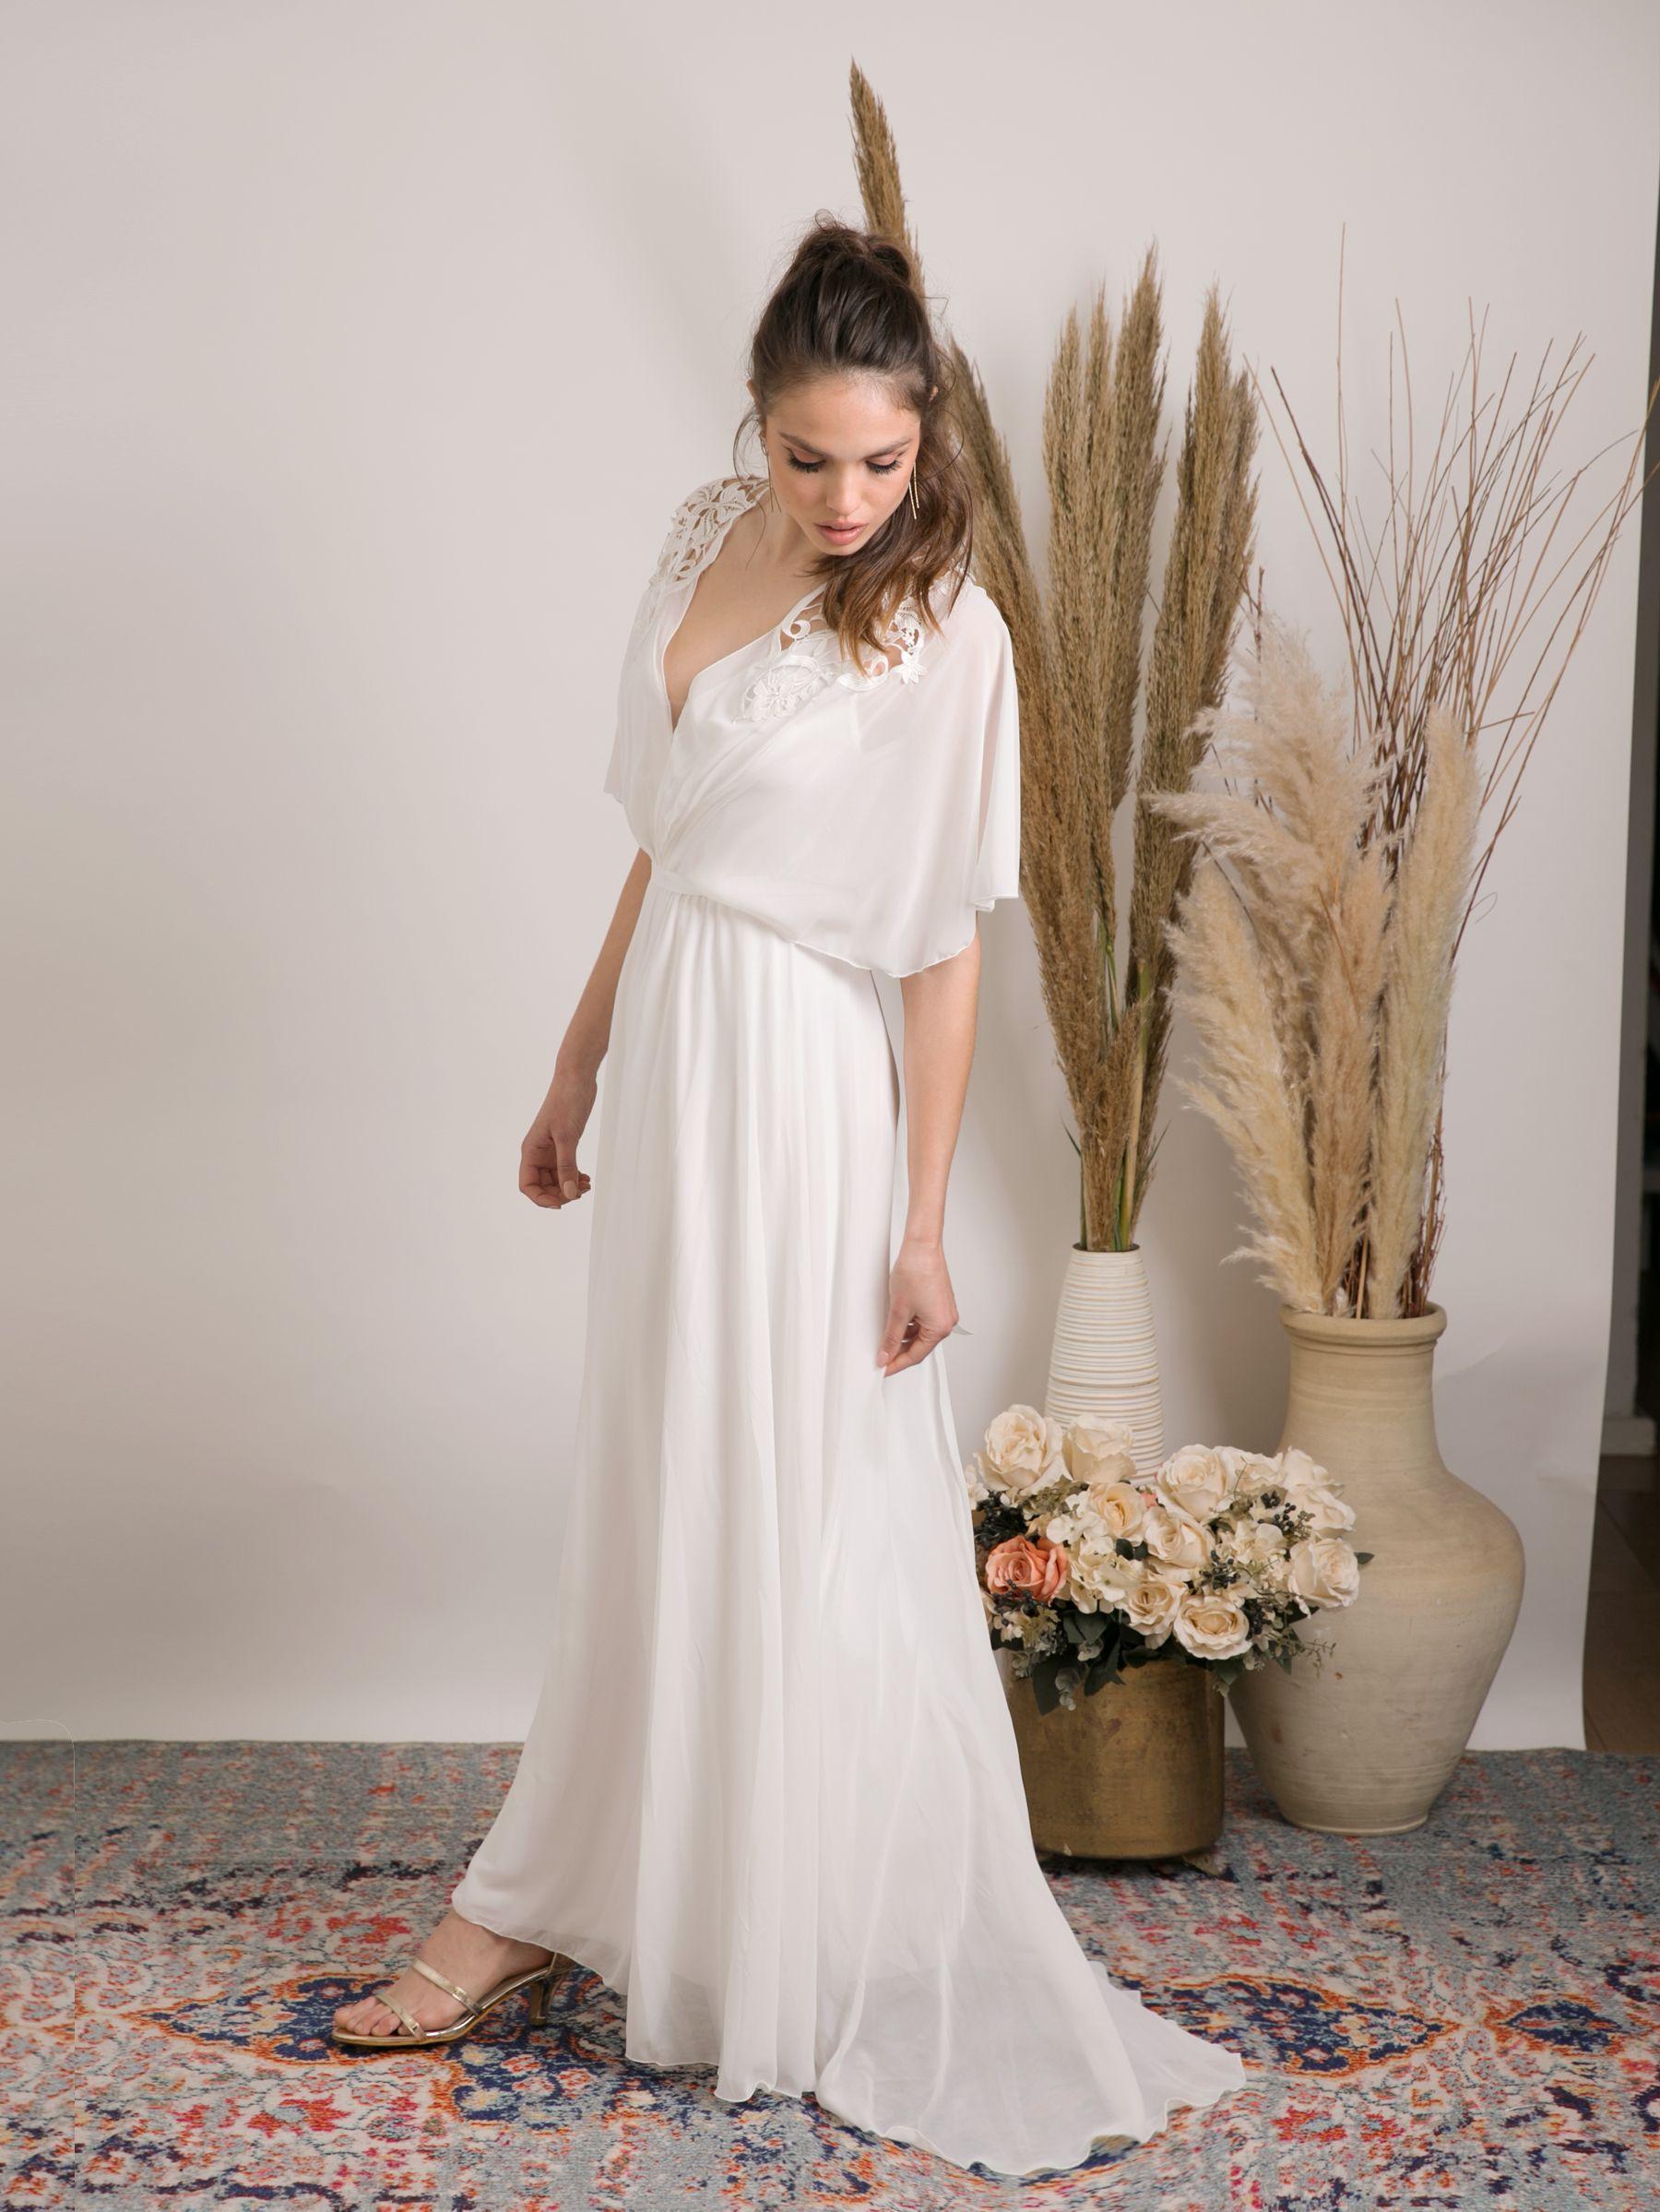 Simple Boho Wedding Dress Modest And Effortlessly Beautiful Etsy Boho Wedding Dress Wedding Dress Long Sleeve Wedding Dresses [ 2398 x 1800 Pixel ]